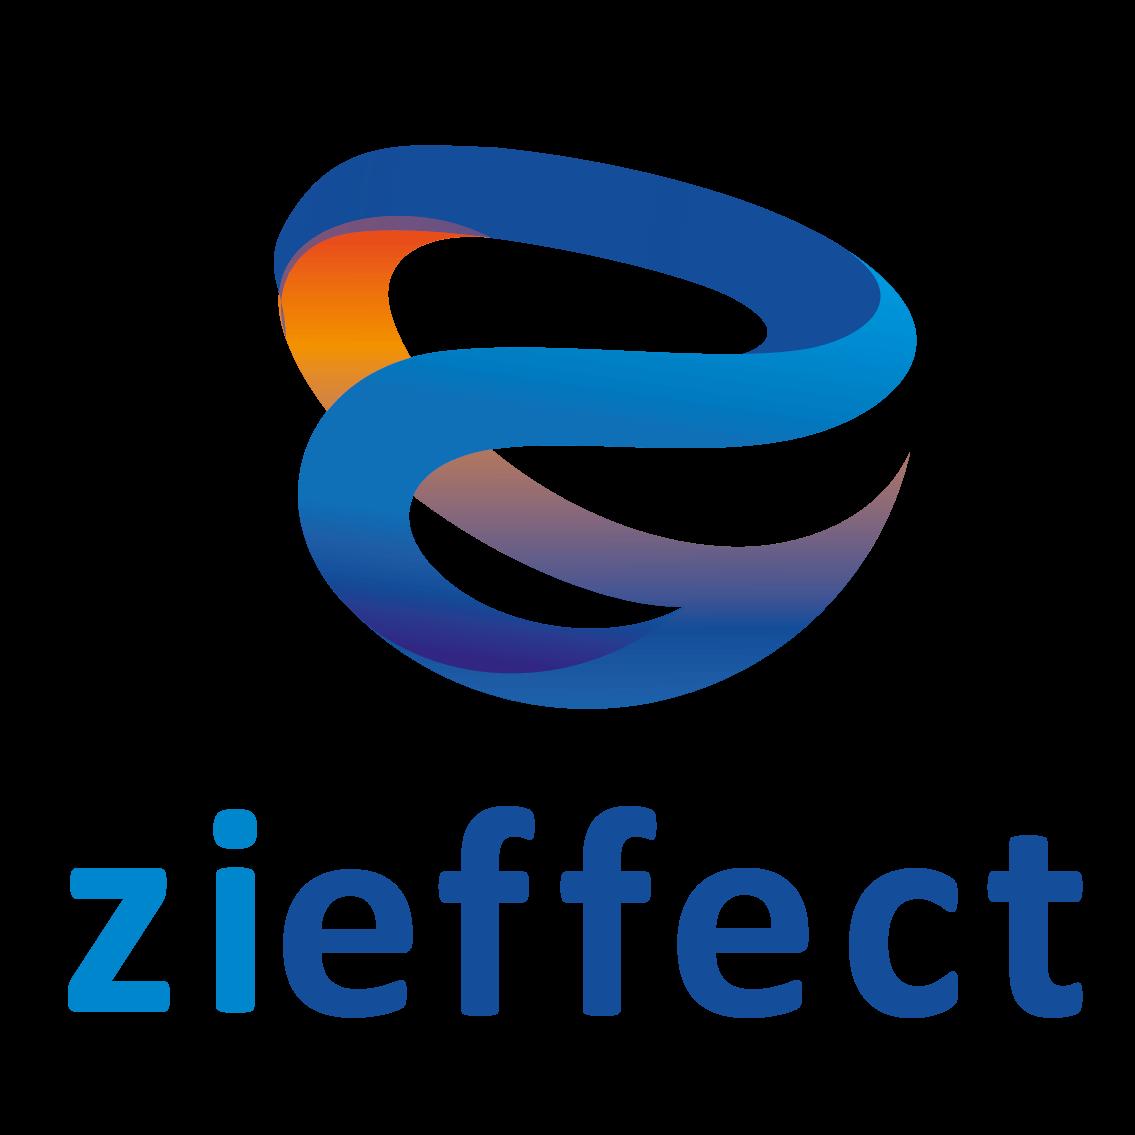 Zieffect